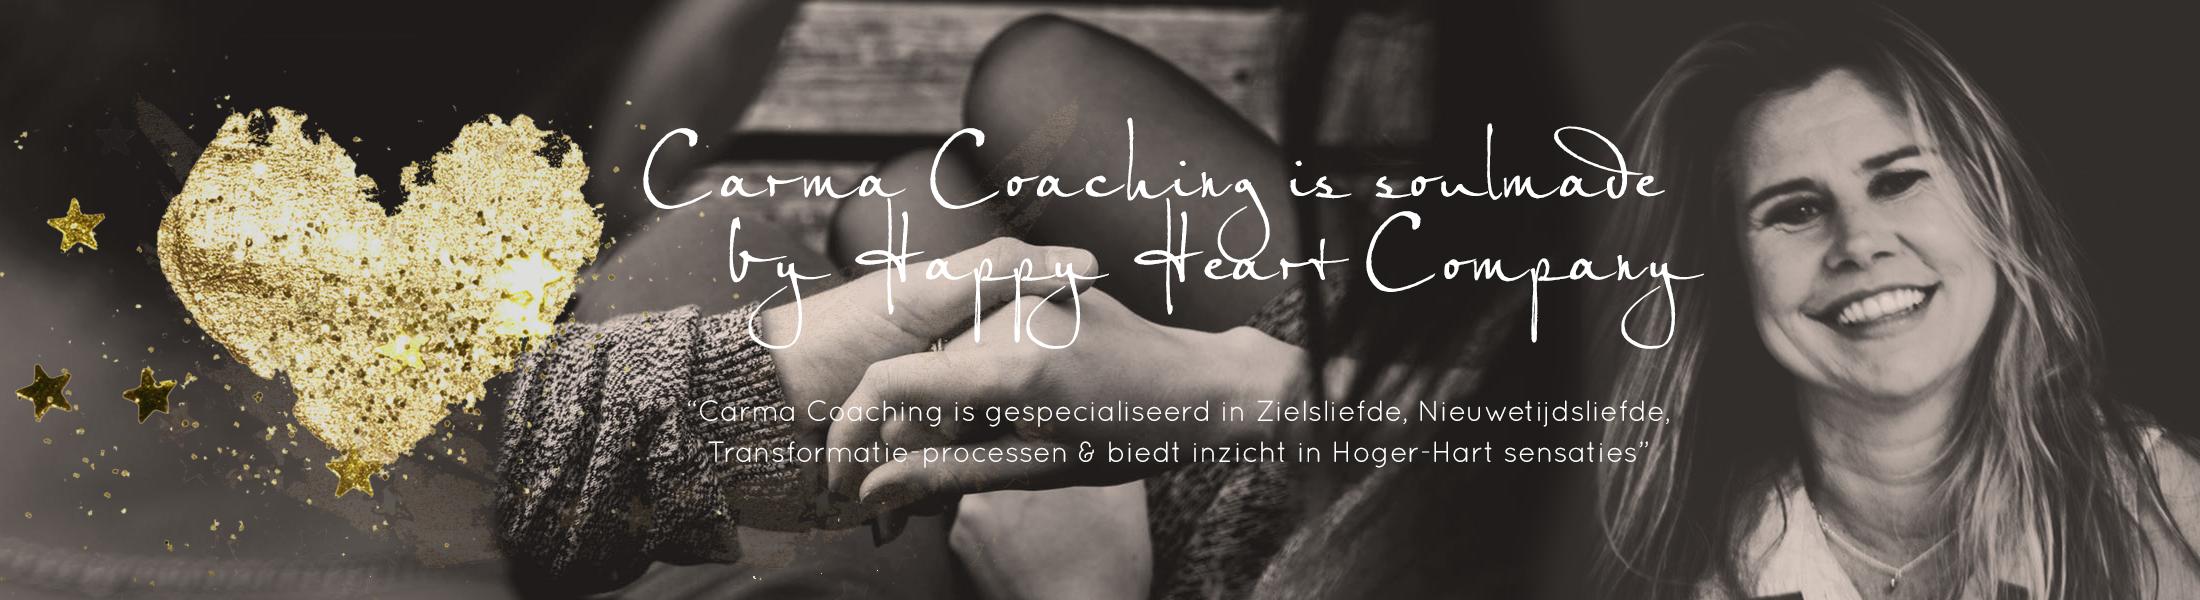 Header Carma Coaching